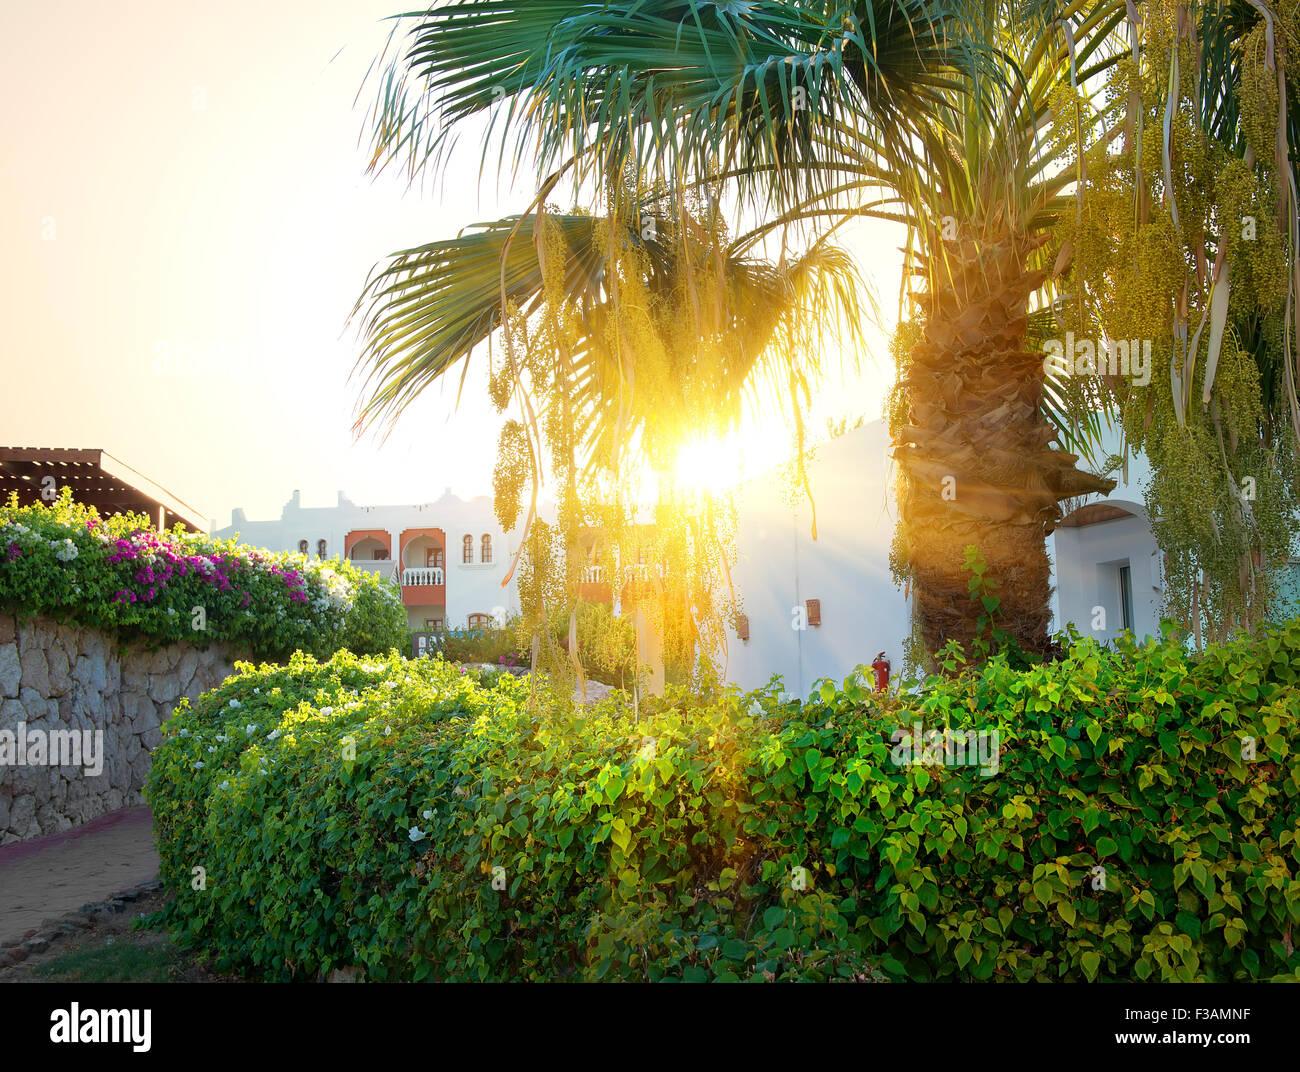 Luminosa alba hotel resort in Egitto Immagini Stock